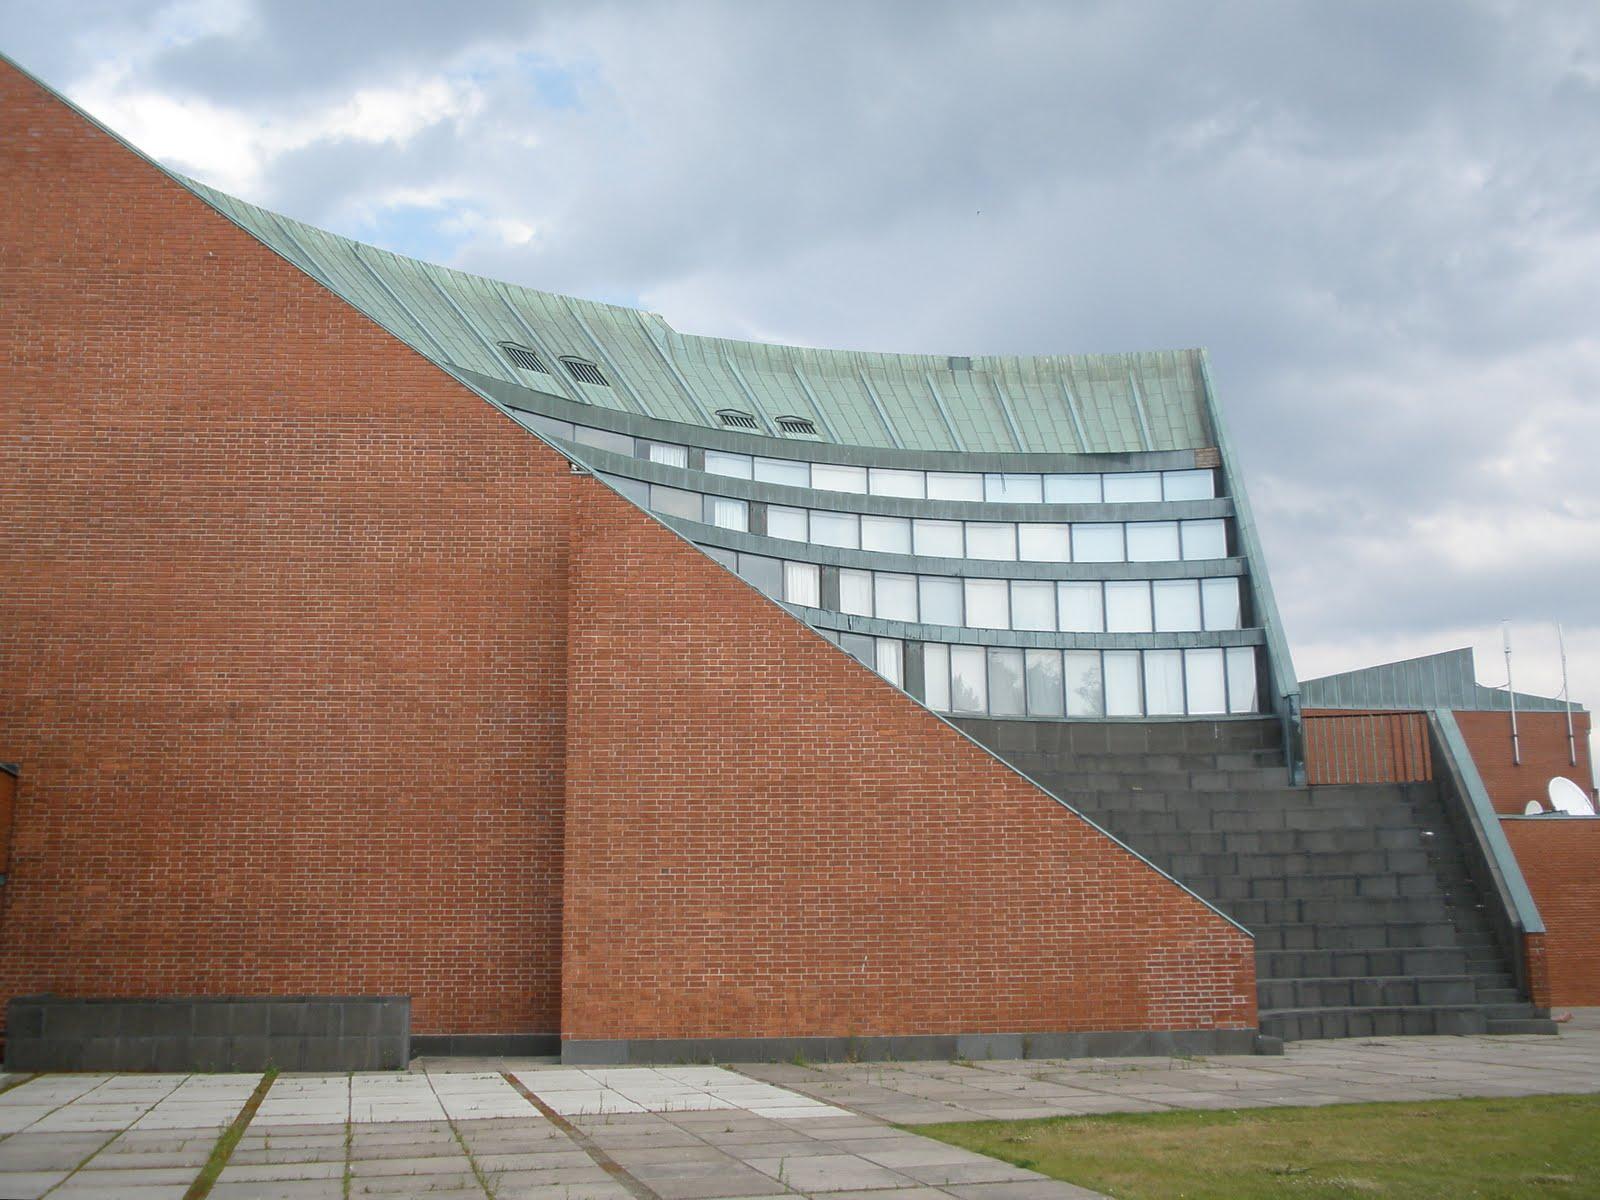 guttae alvar aalto technical university auditorium